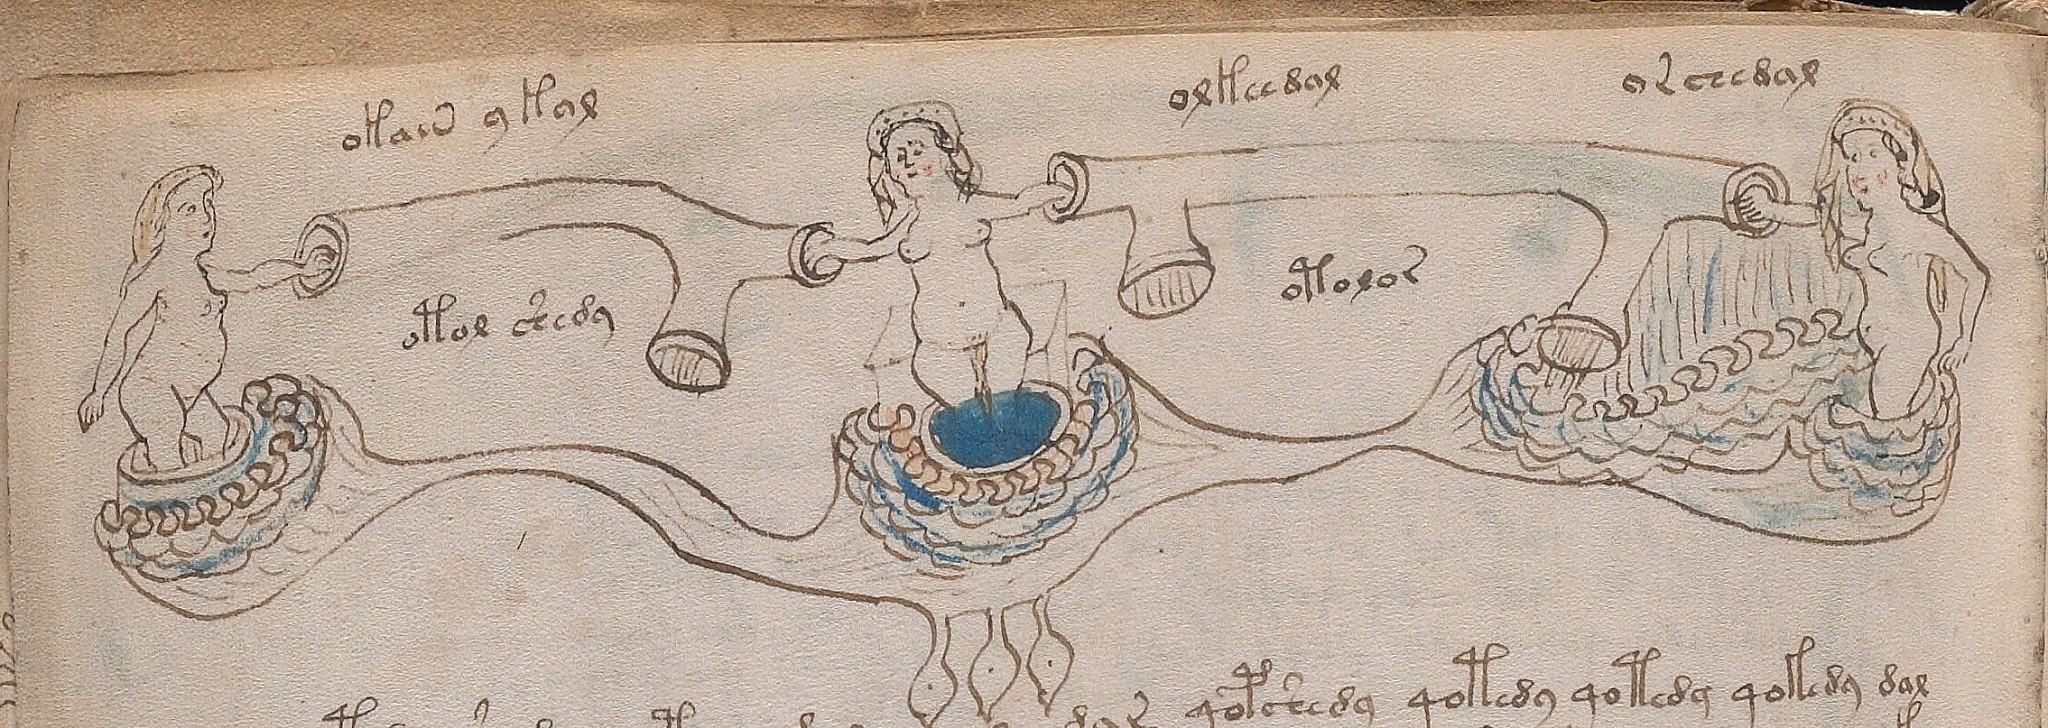 Voynich Manuscript Pdf Free